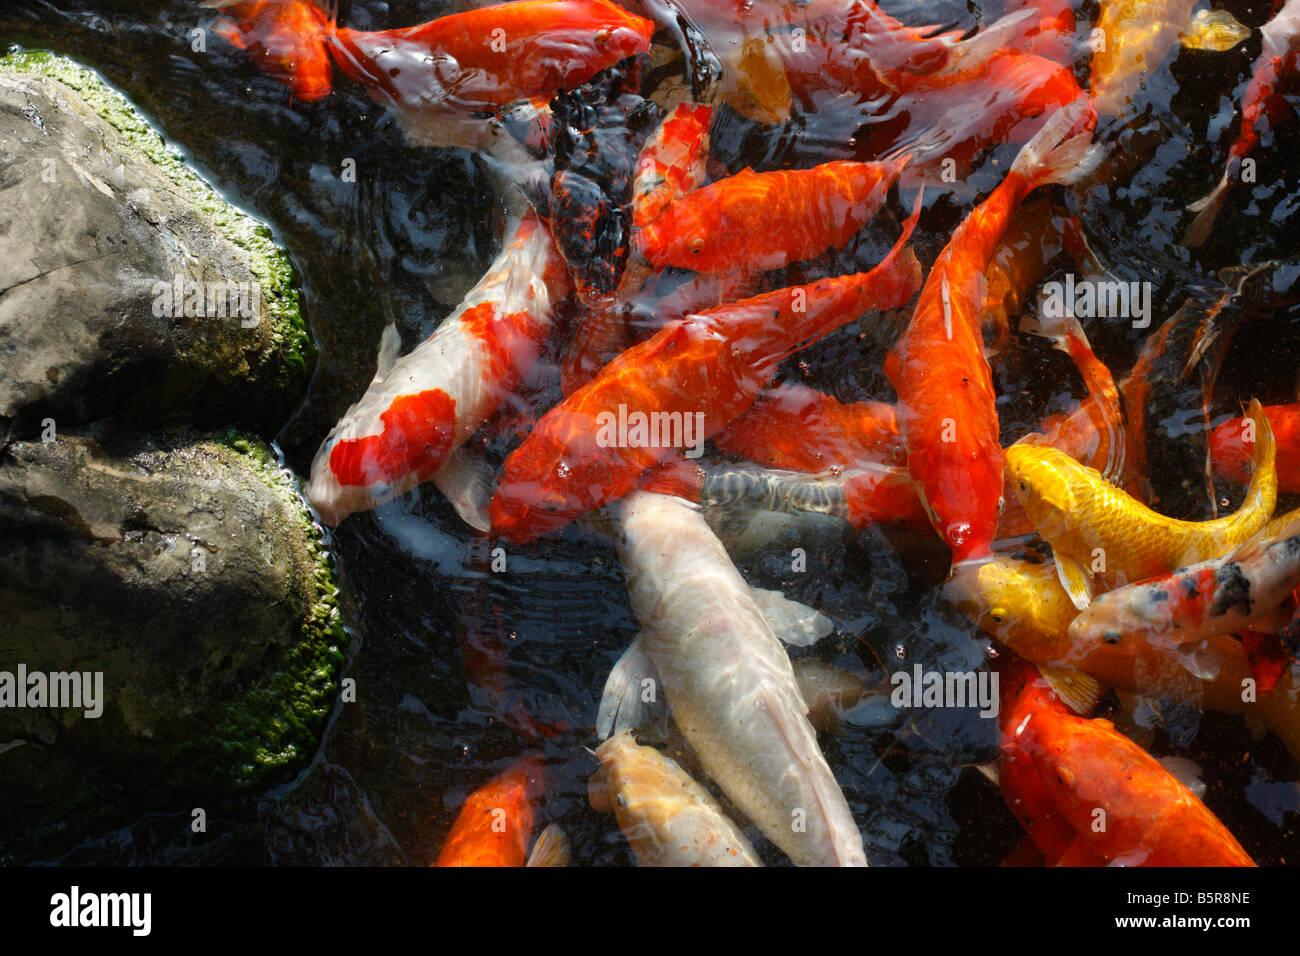 Koi Fish Stock Photos & Koi Fish Stock Images - Alamy